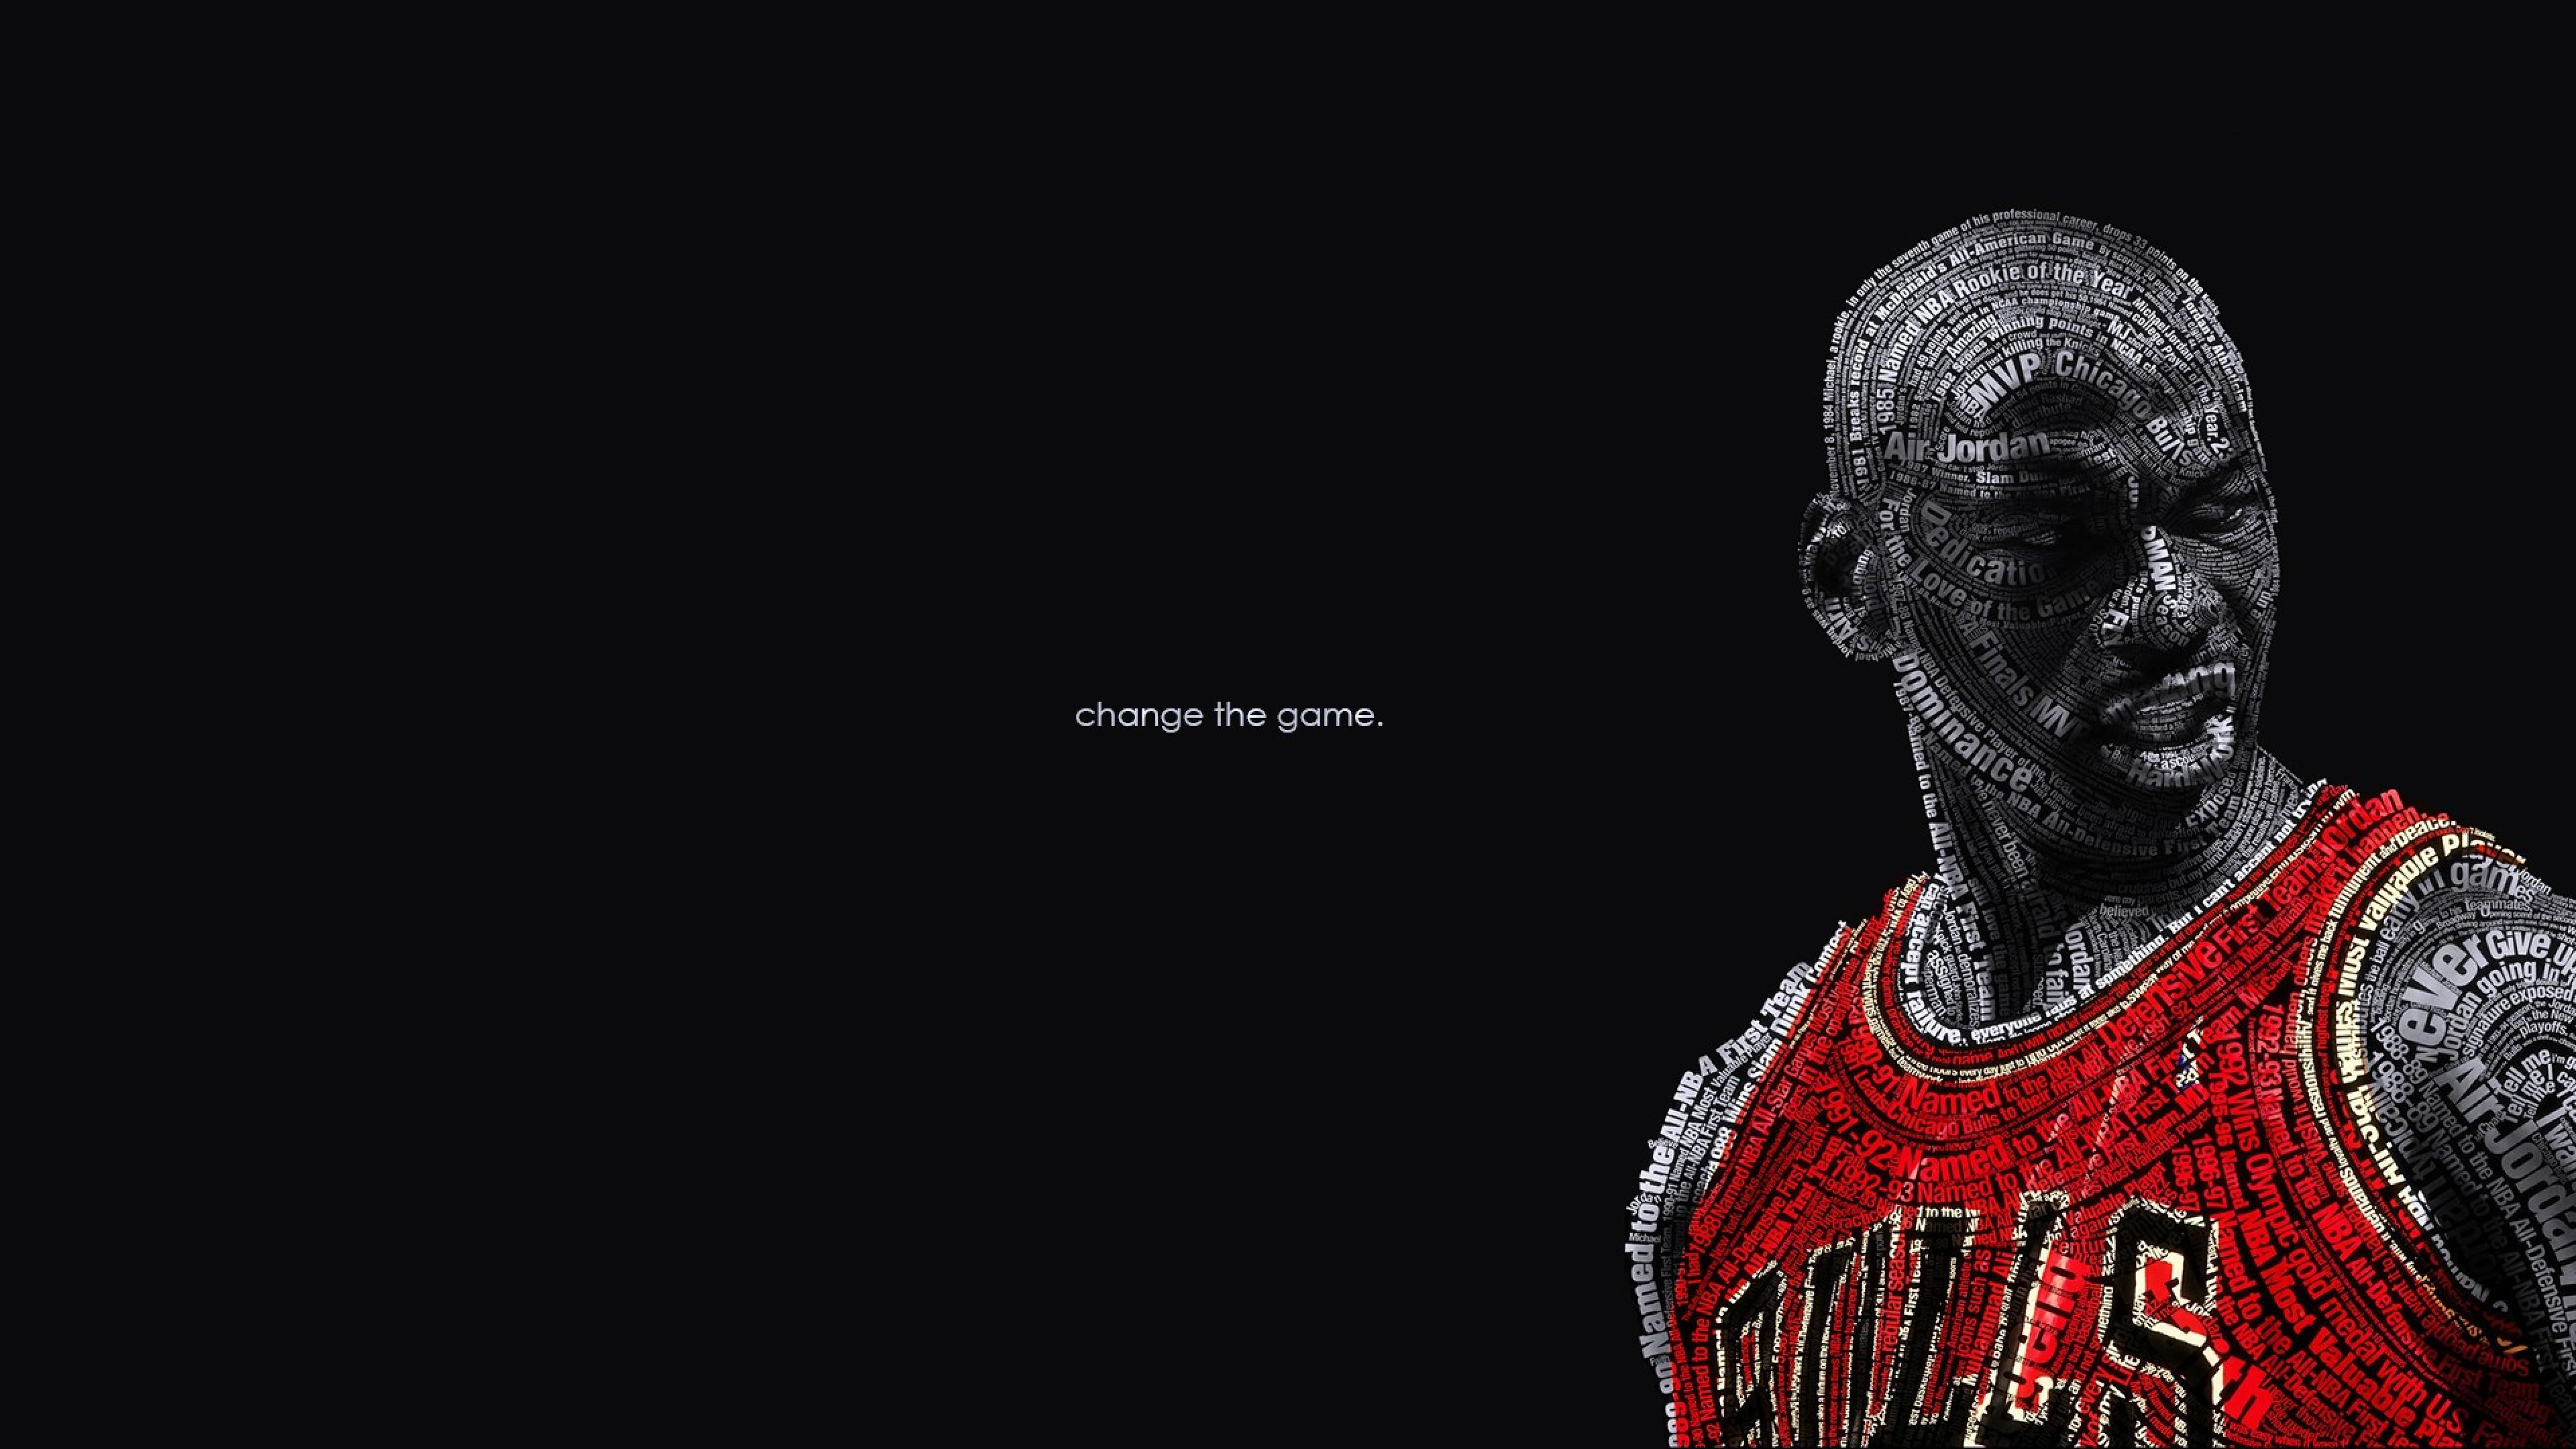 Best Basketball Hd Wallpaper For Desktop And Mobiles 4k Ultra Hd Hd Wallpaper Wallpapers Net